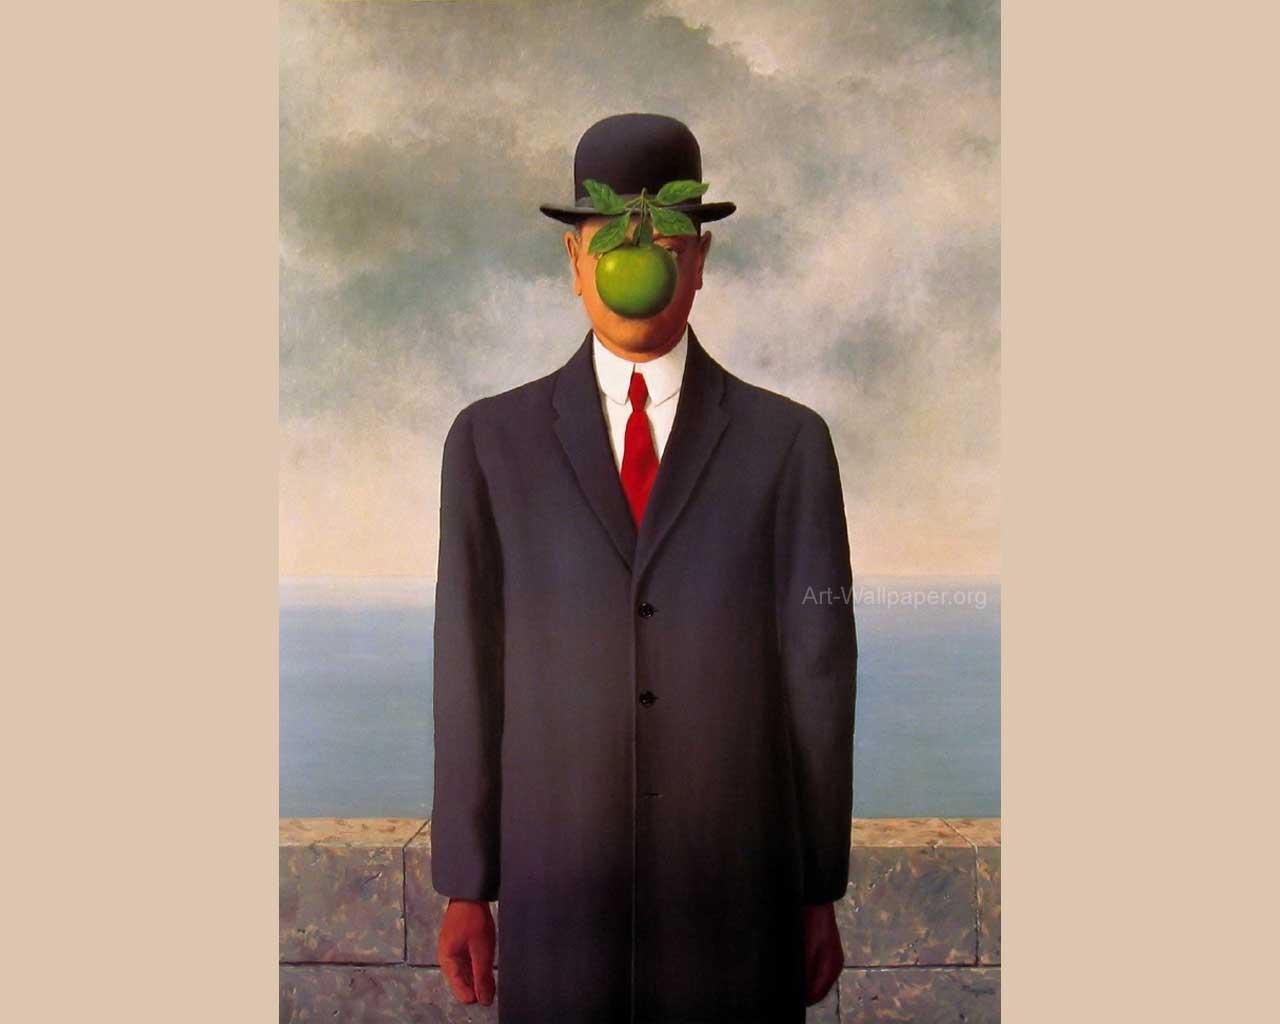 Rene Magritte Wallpaper 1280x1024